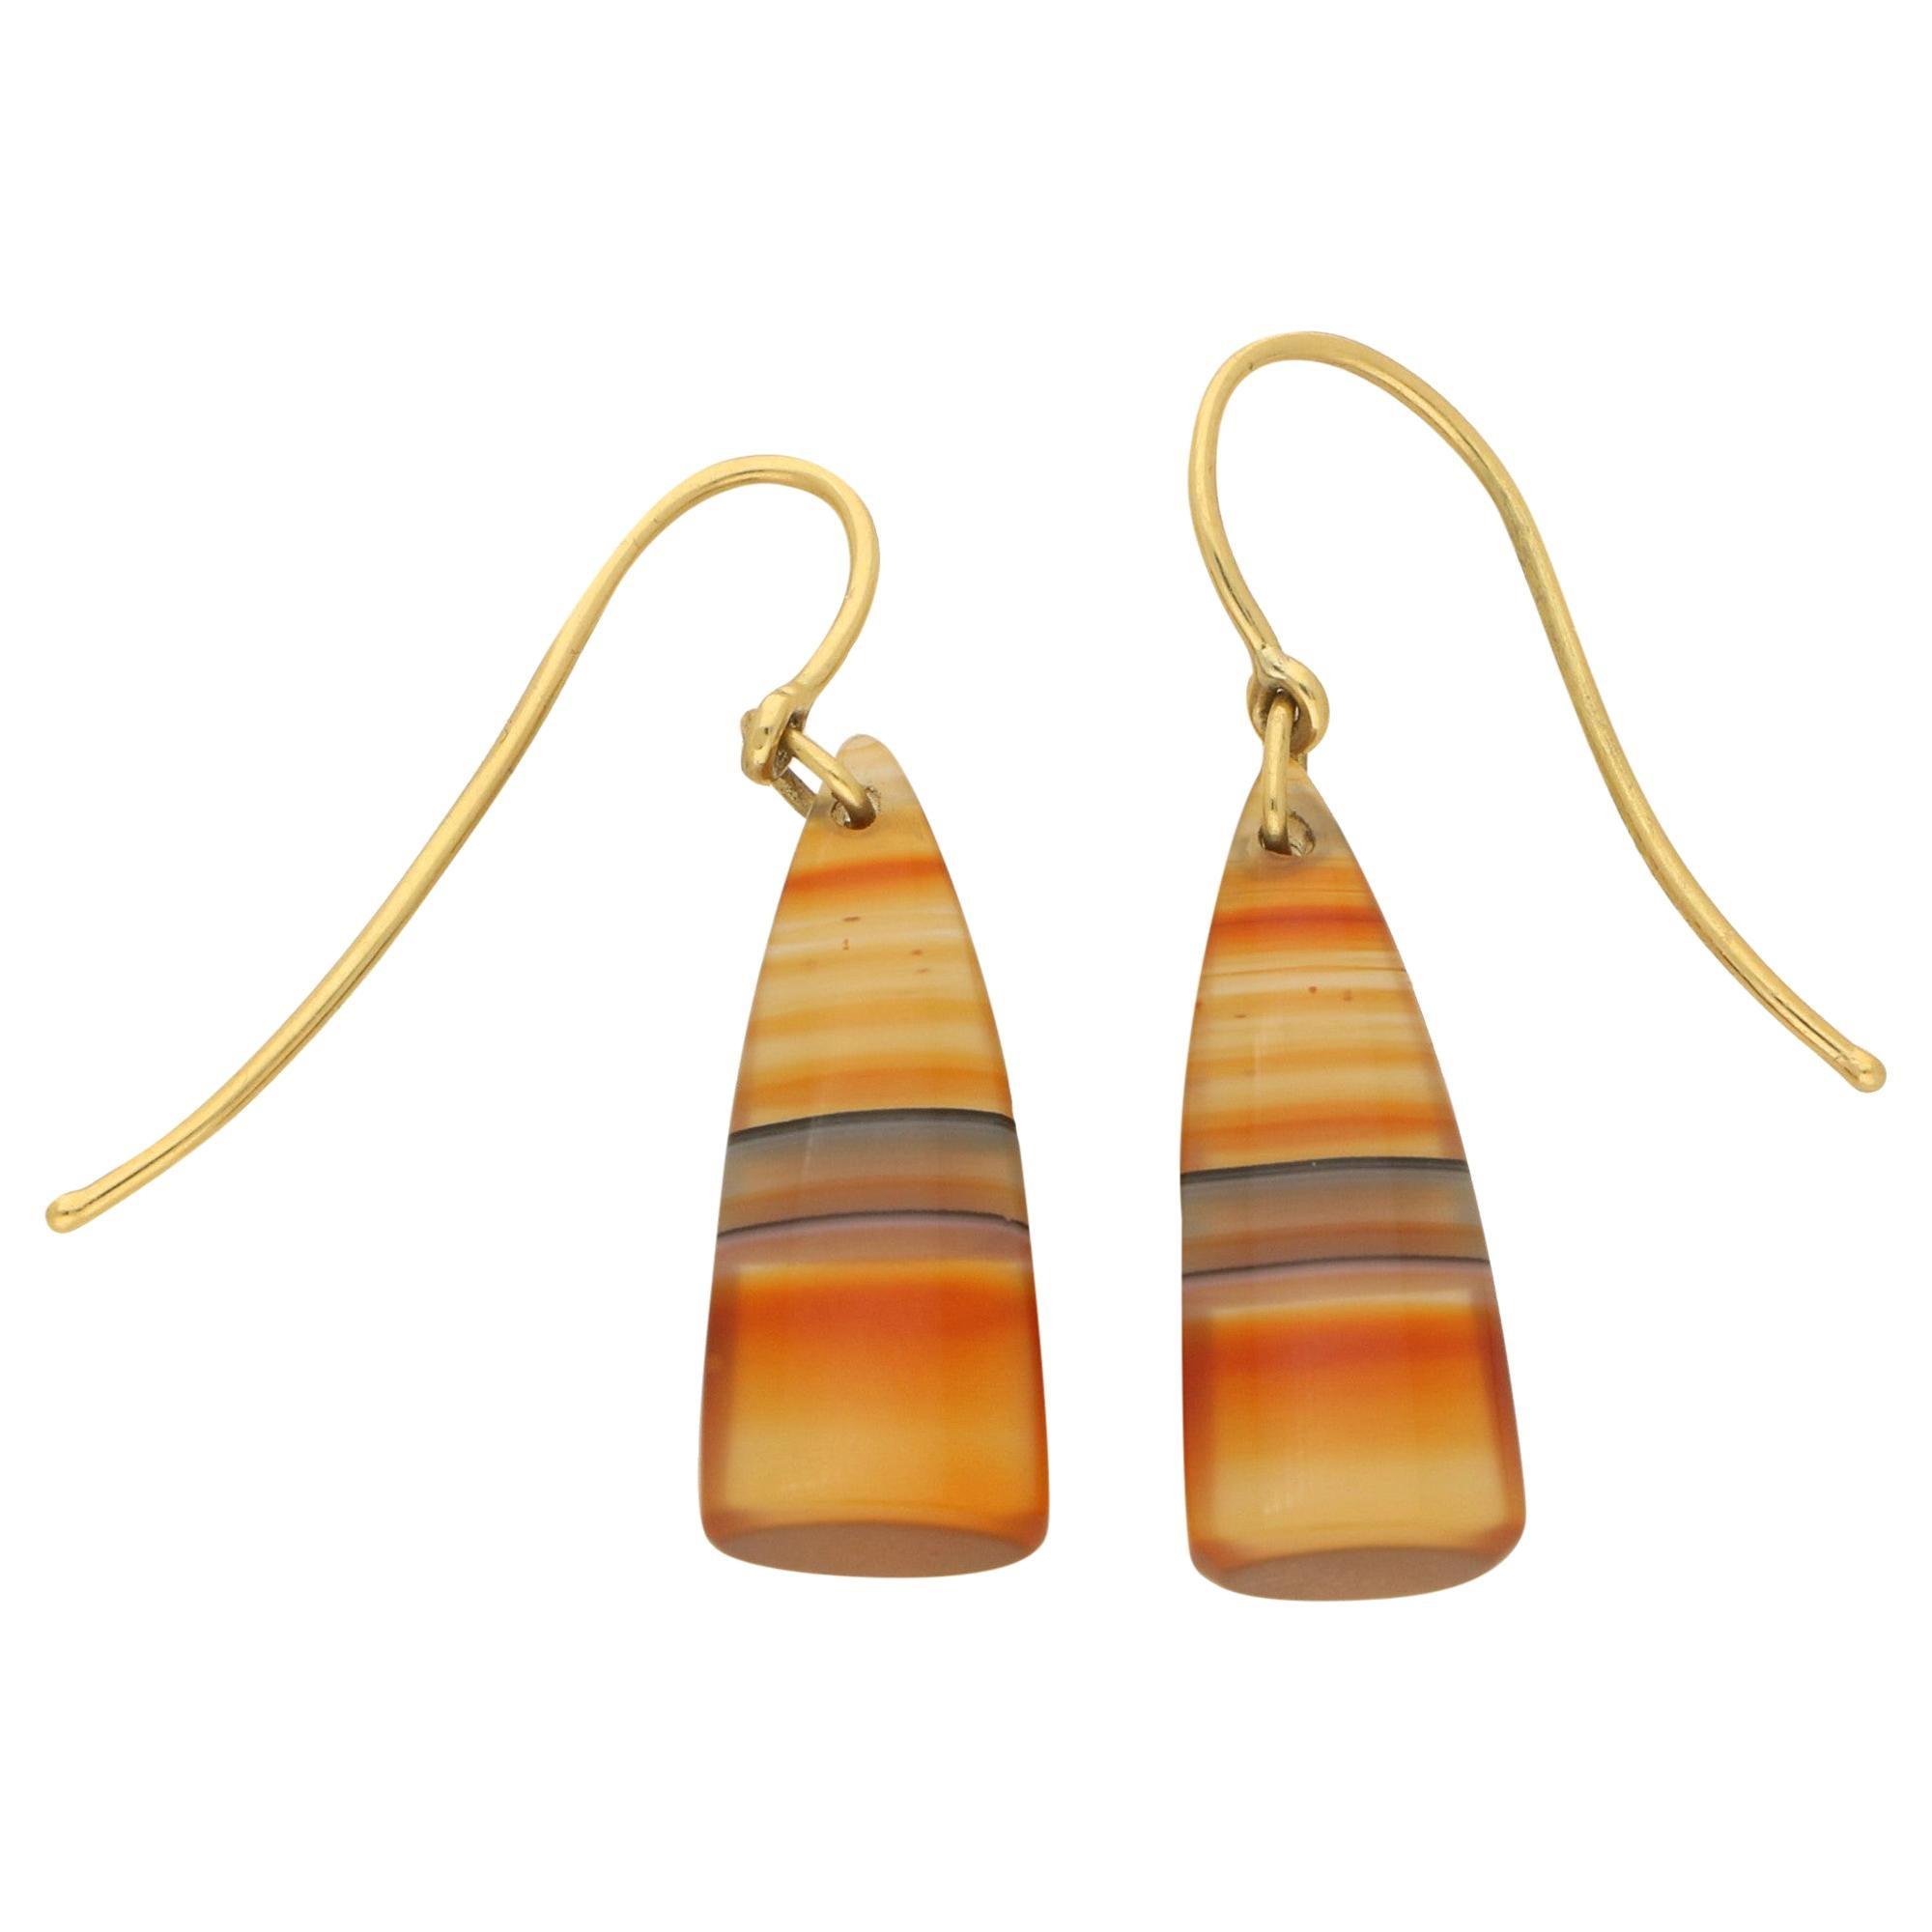 Chalcedony Drop Earrings in 9 Carat Yellow Gold